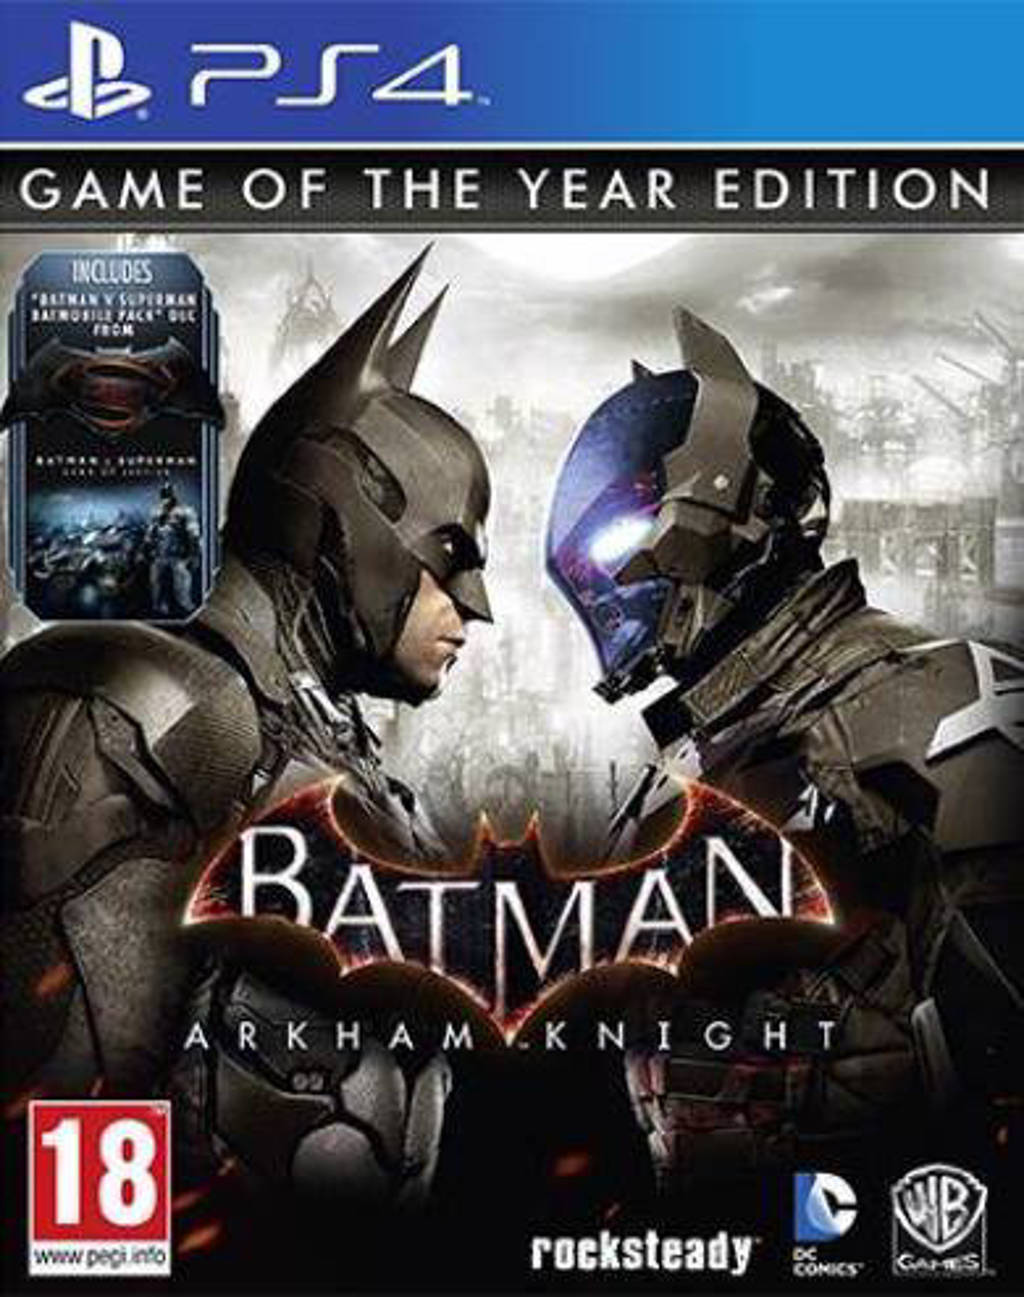 Batman Arkham knight (GOTY) (PlayStation 4)